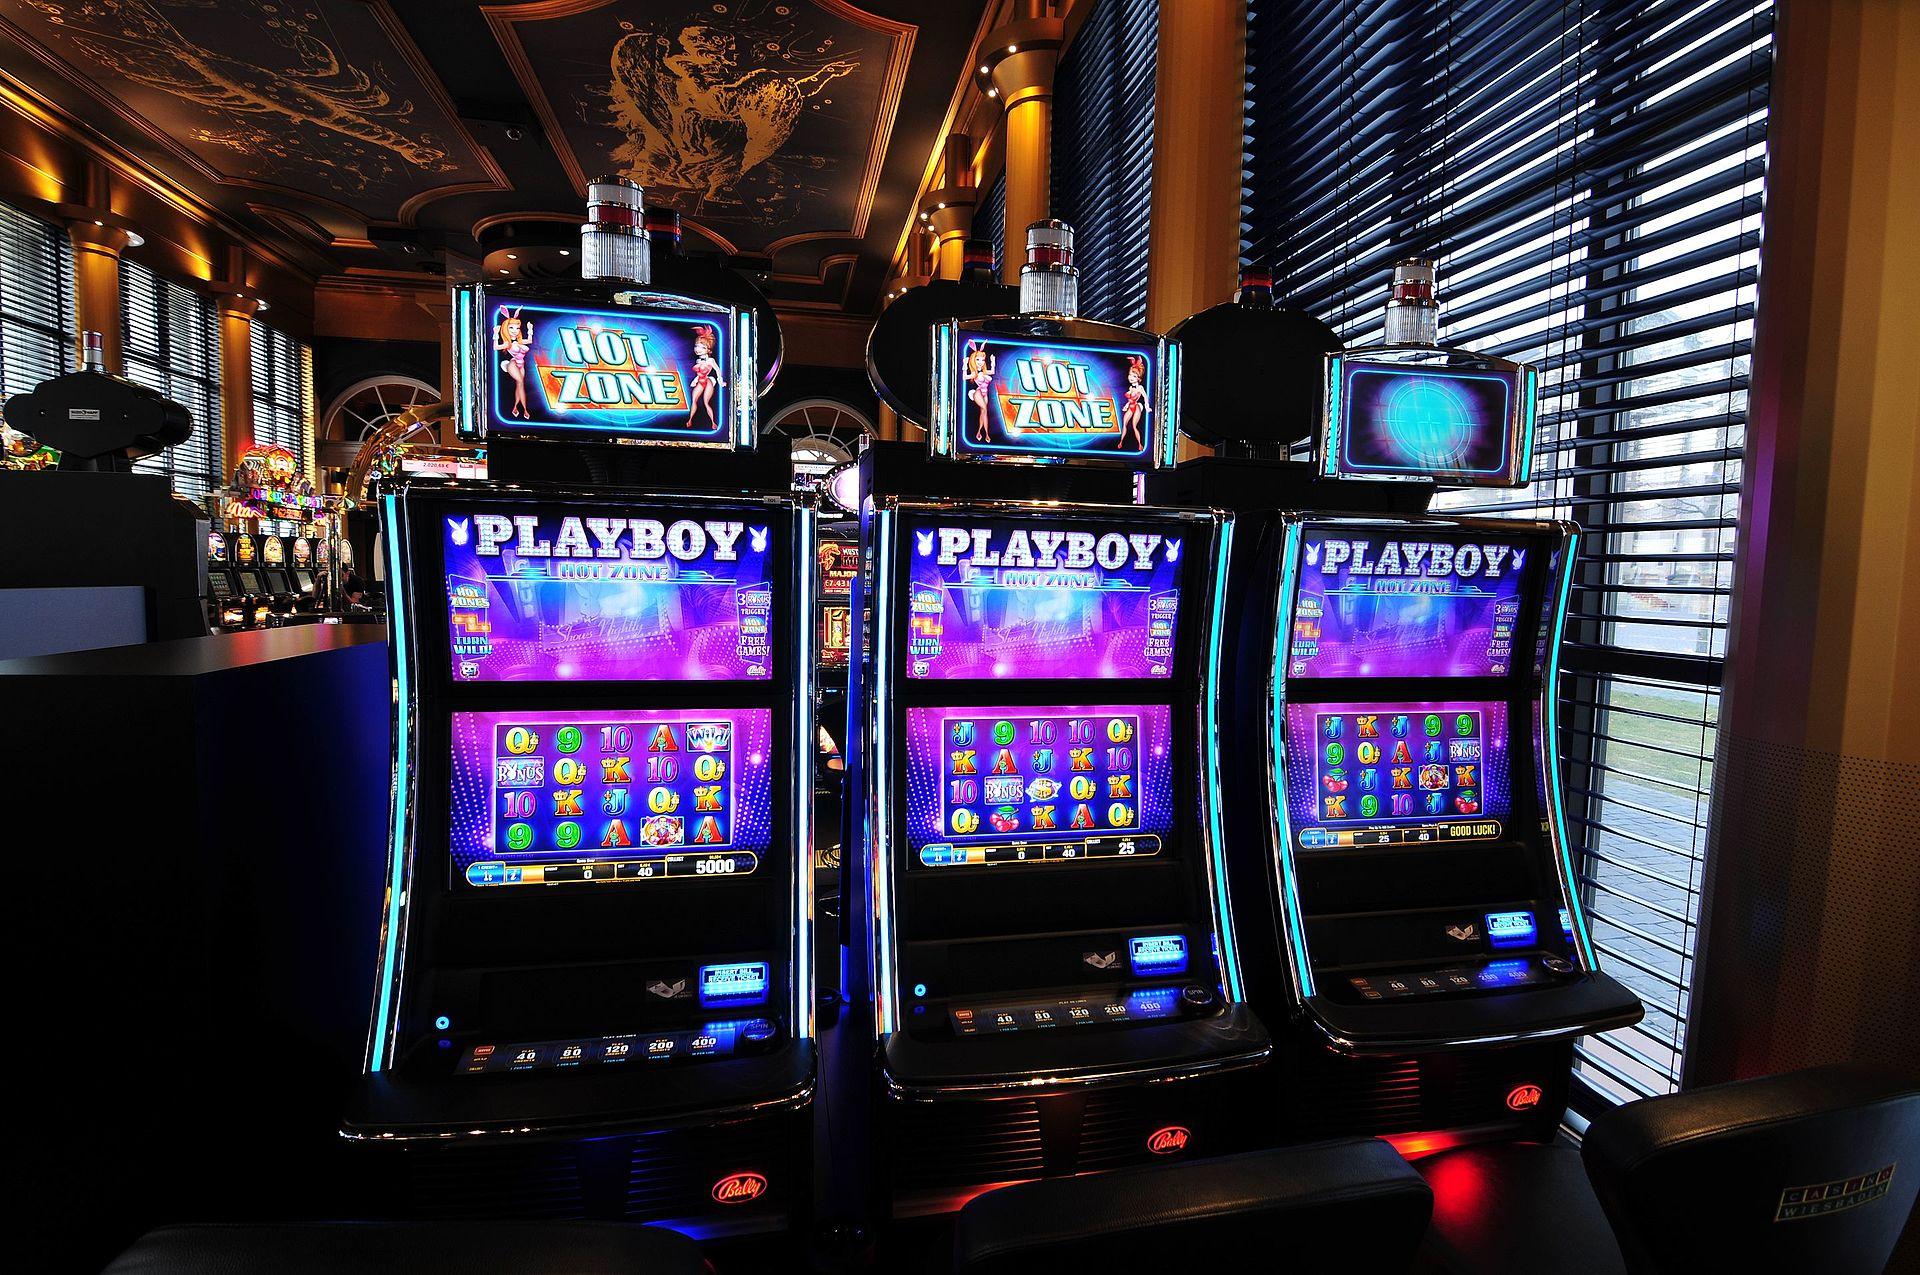 Spielautomat Gewinnchancen - 616857